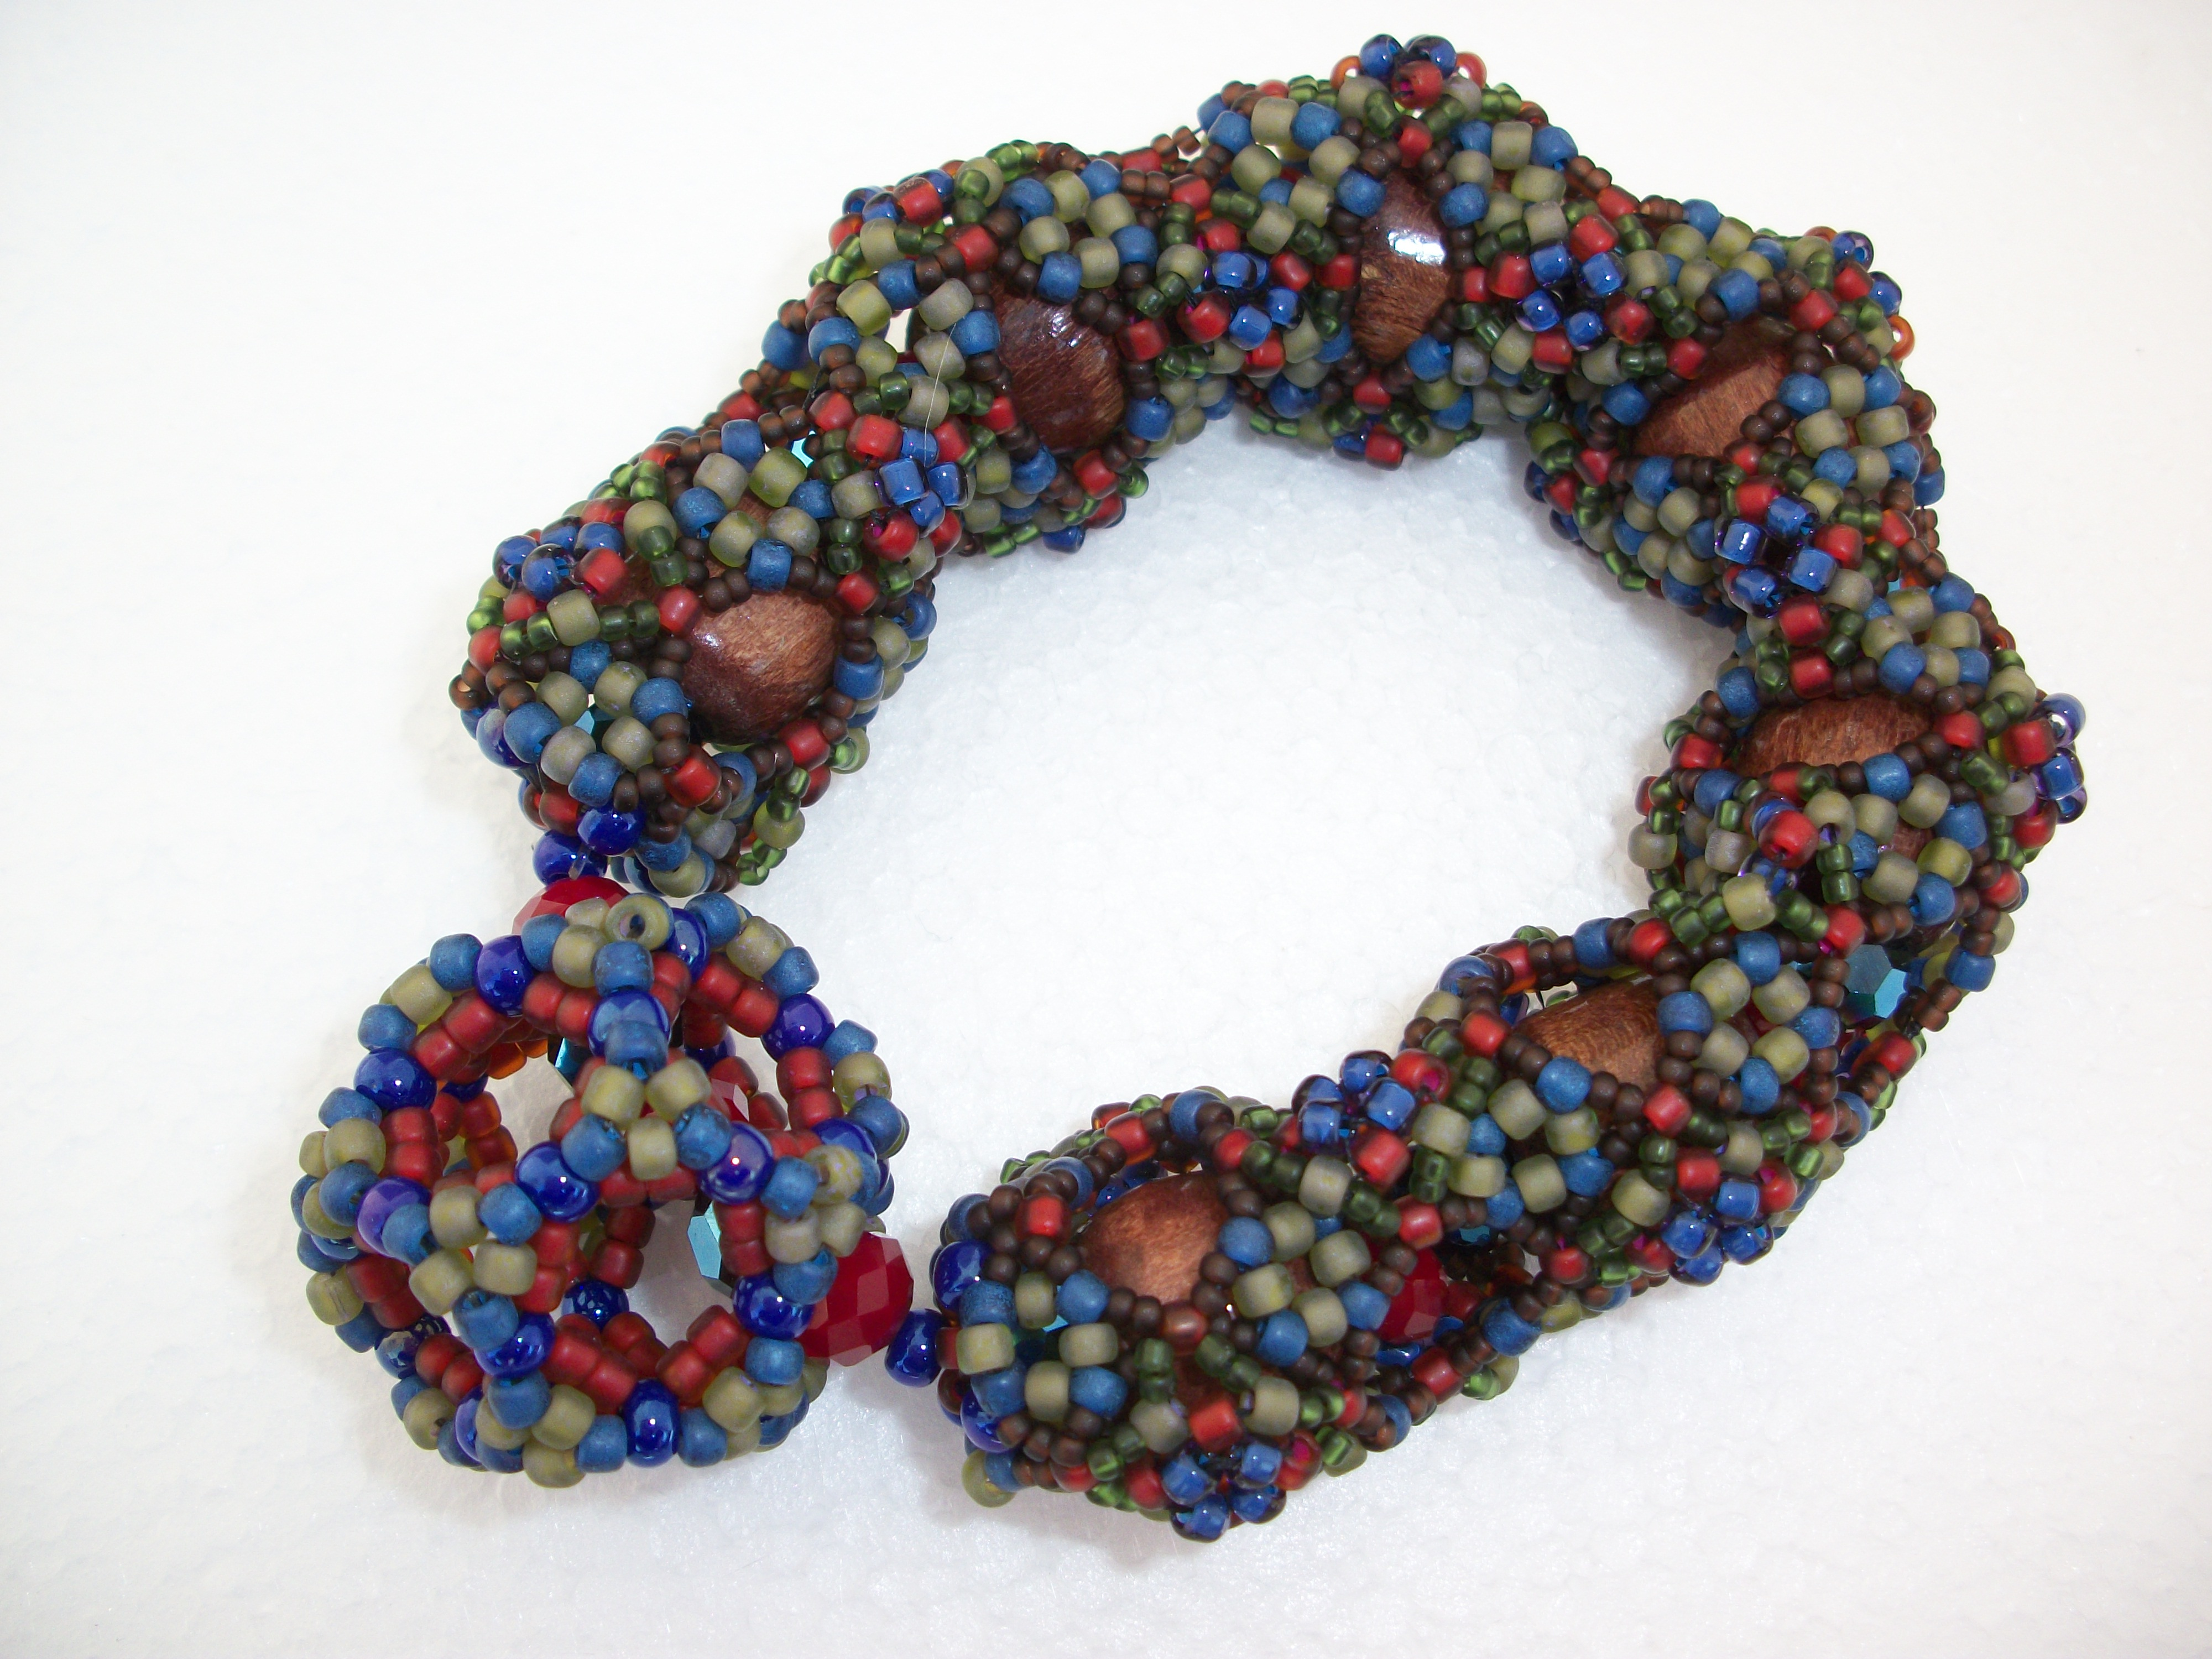 Dungaree Bracelet